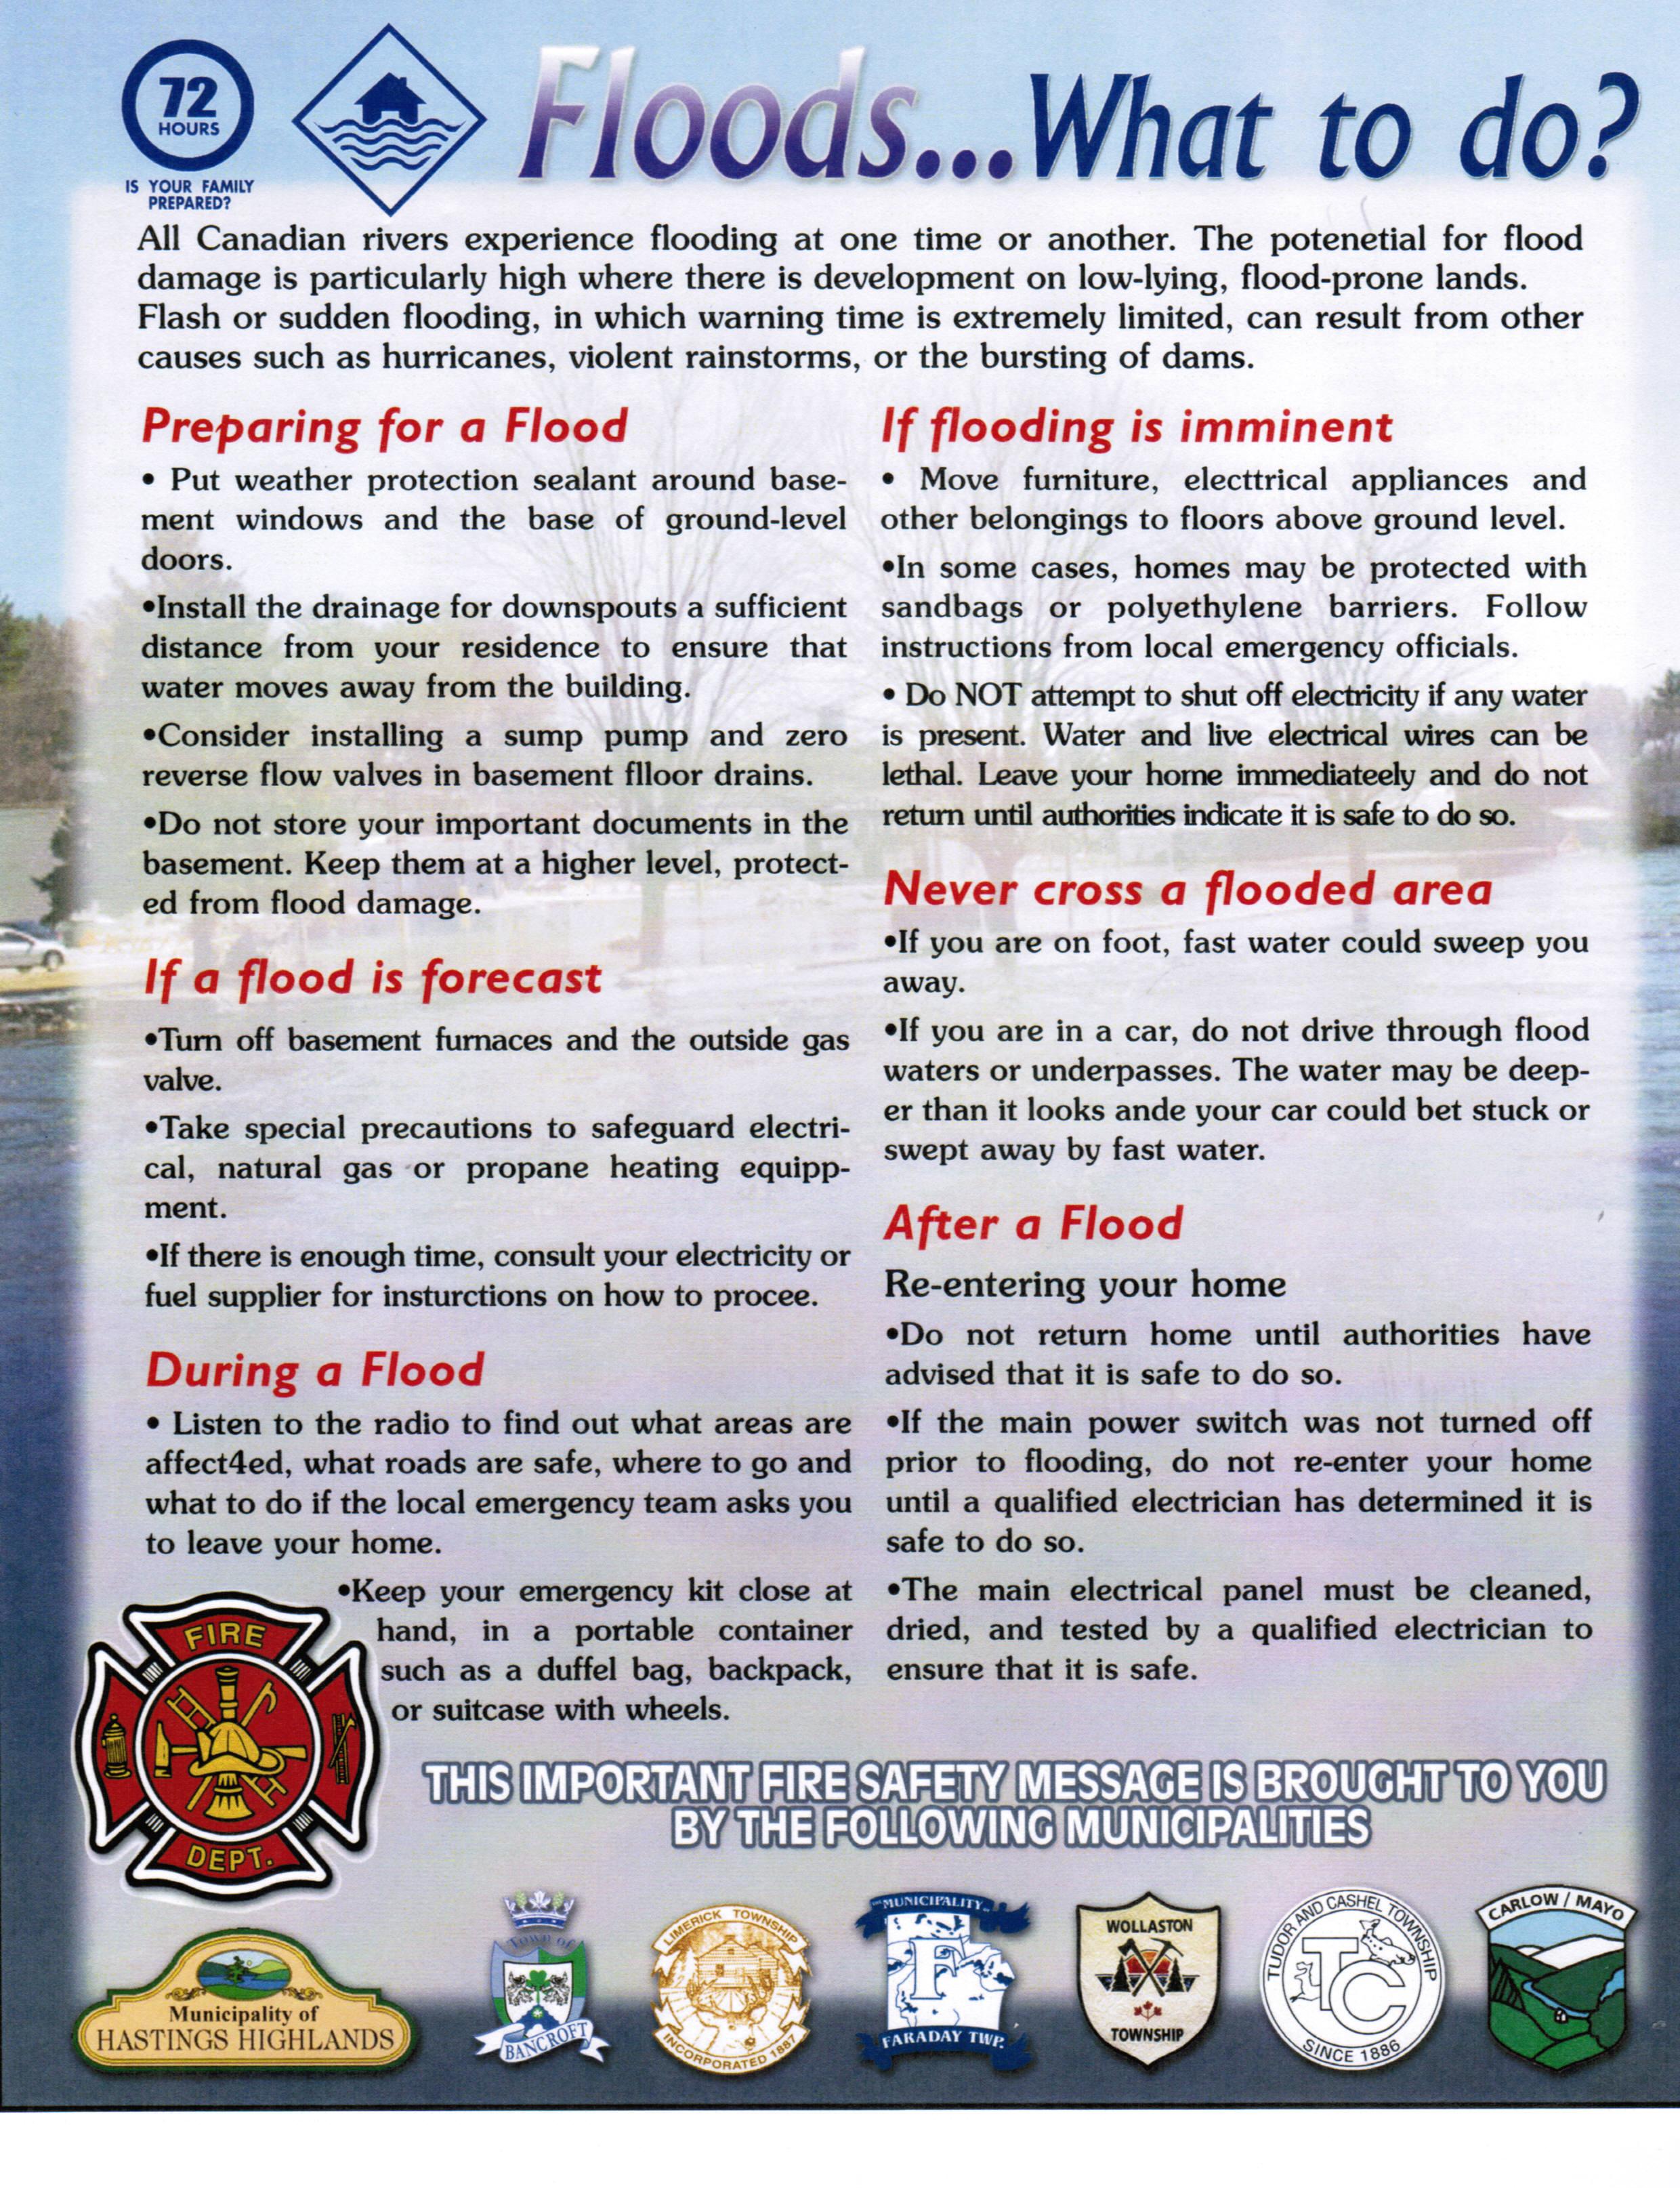 Flood Prevention 2014 B-Times April